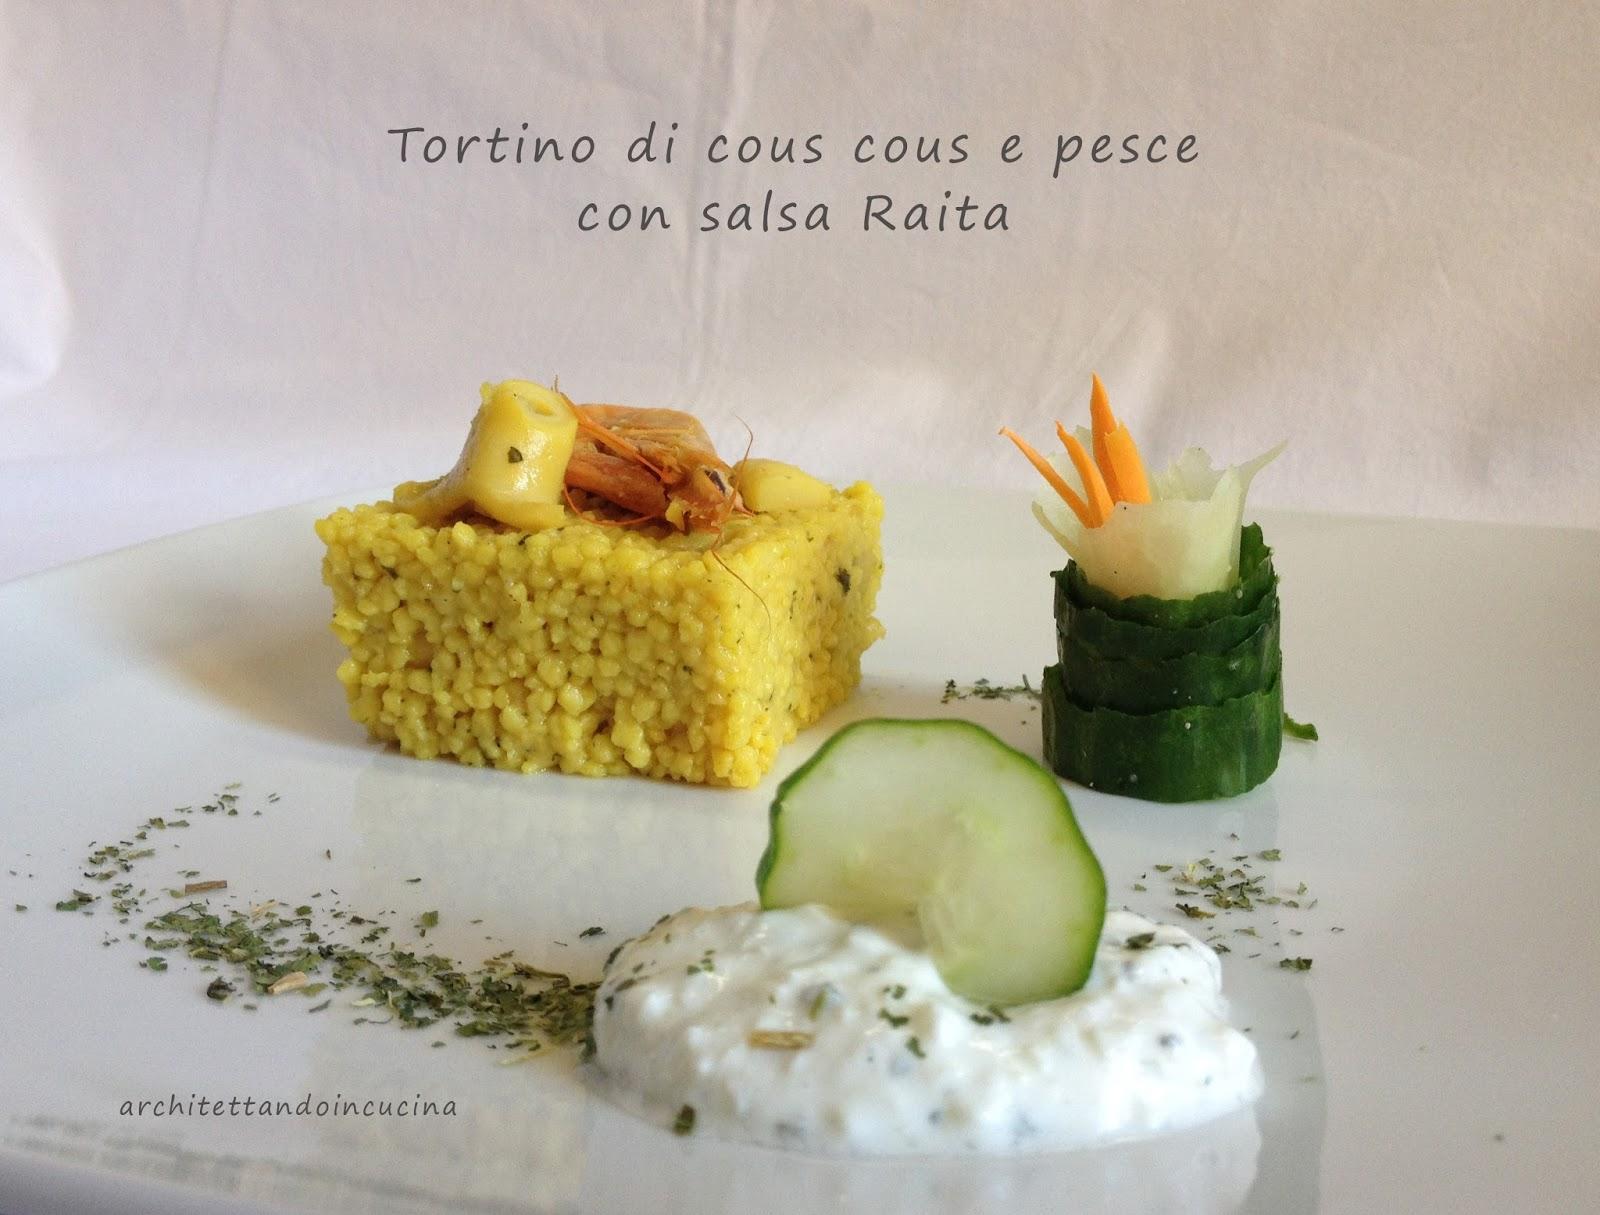 architettando in cucina: La cucina ruffiana - take away da gourmet ...